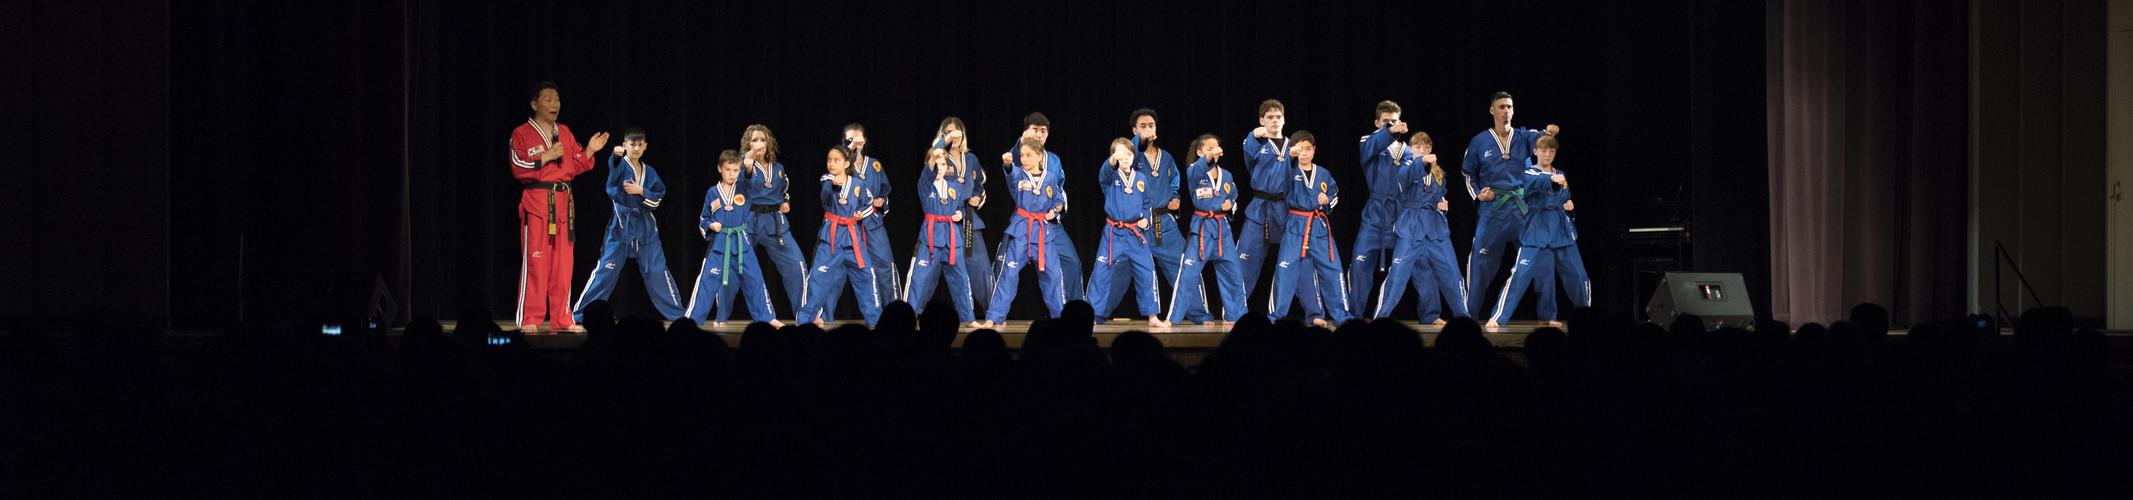 taekwondo, demo team, performance, eugene, oregon